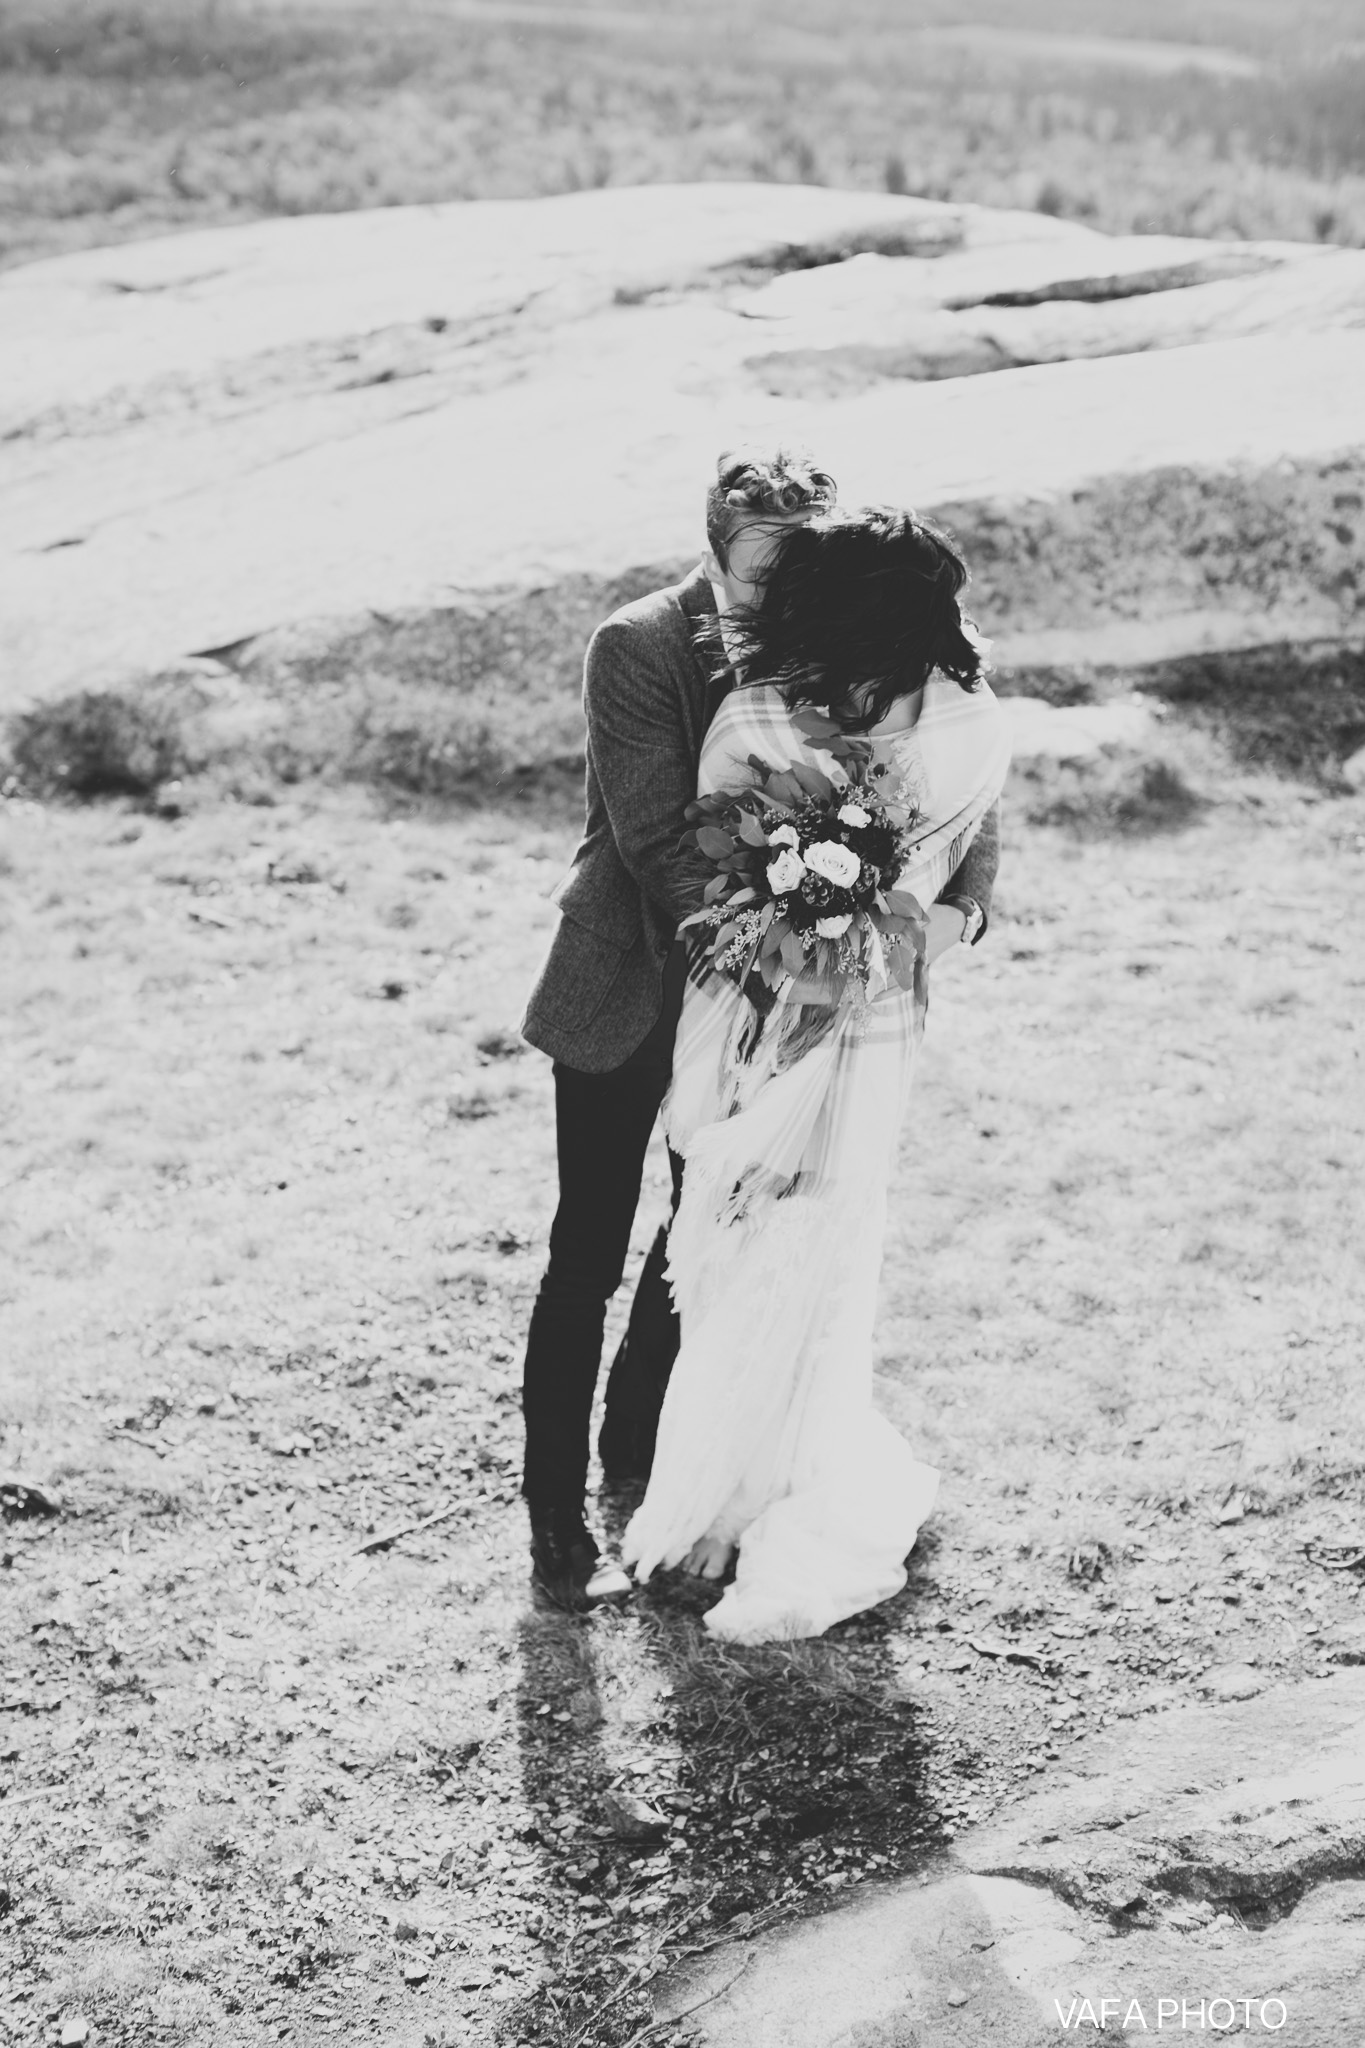 Hogback-Mountain-Wedding-Chelsea-Josh-Vafa-Photo-450.jpg